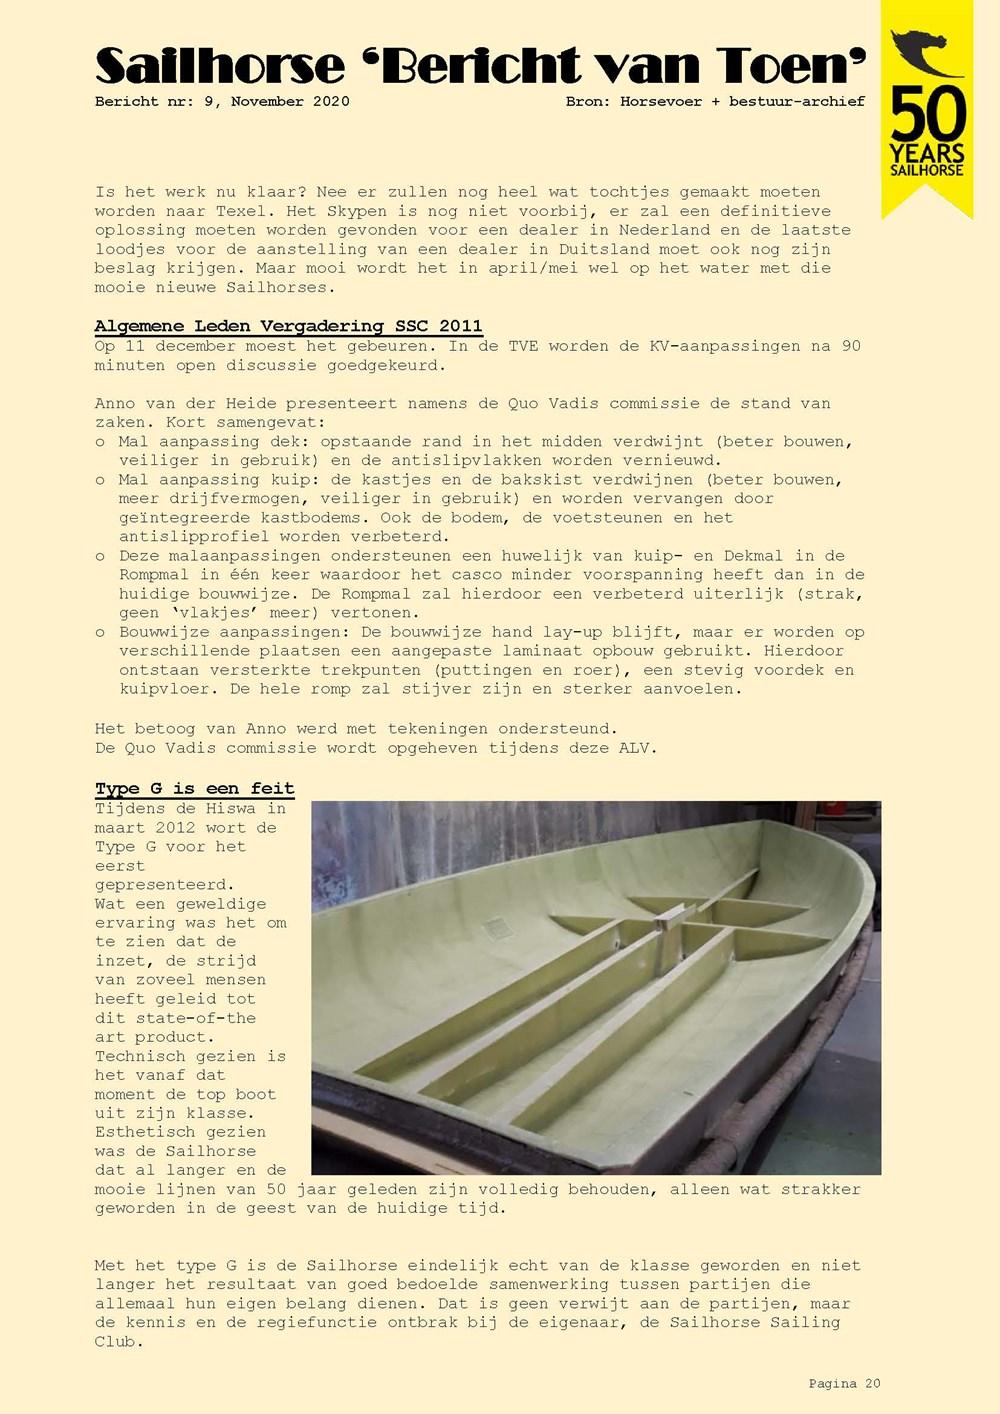 BvT09_Page_20.jpg